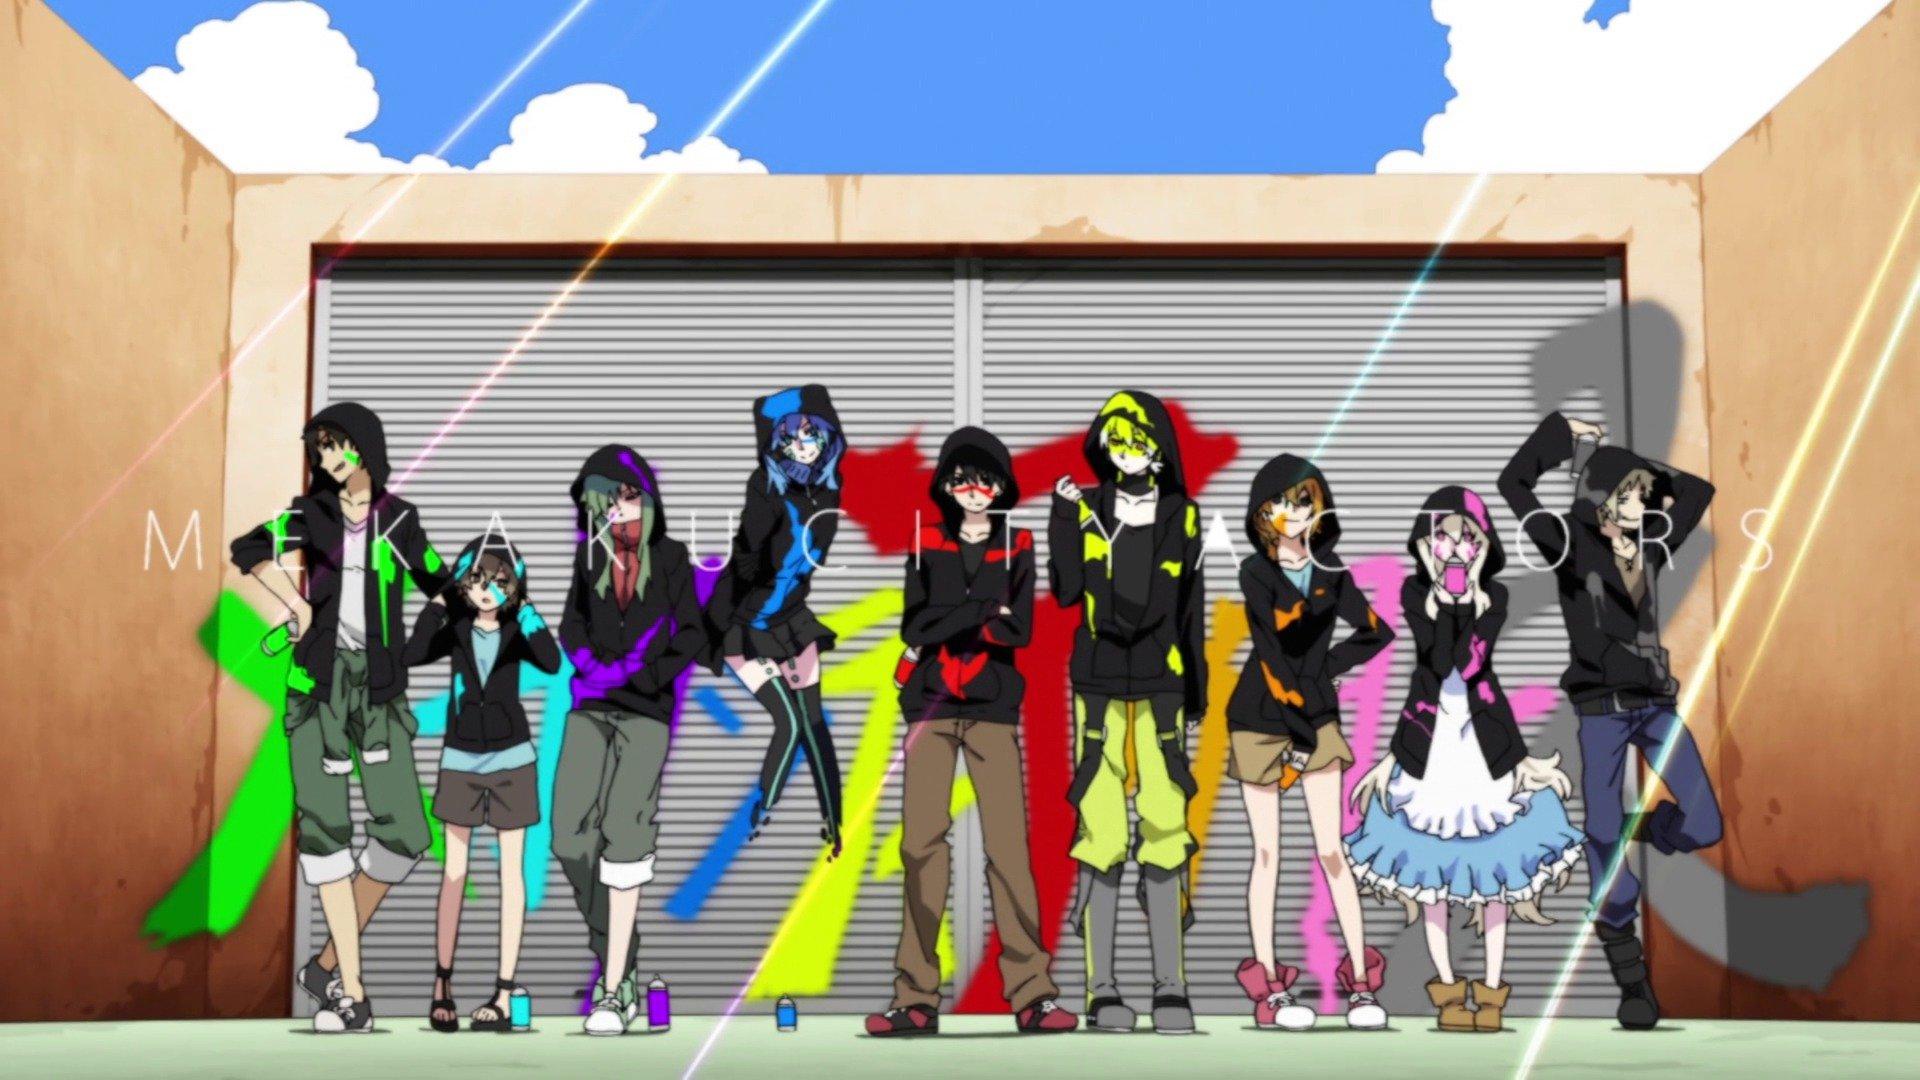 Anime Wallpaper Free Download Mekaku City Actors Anime Wallpaper 1920x1080 590680